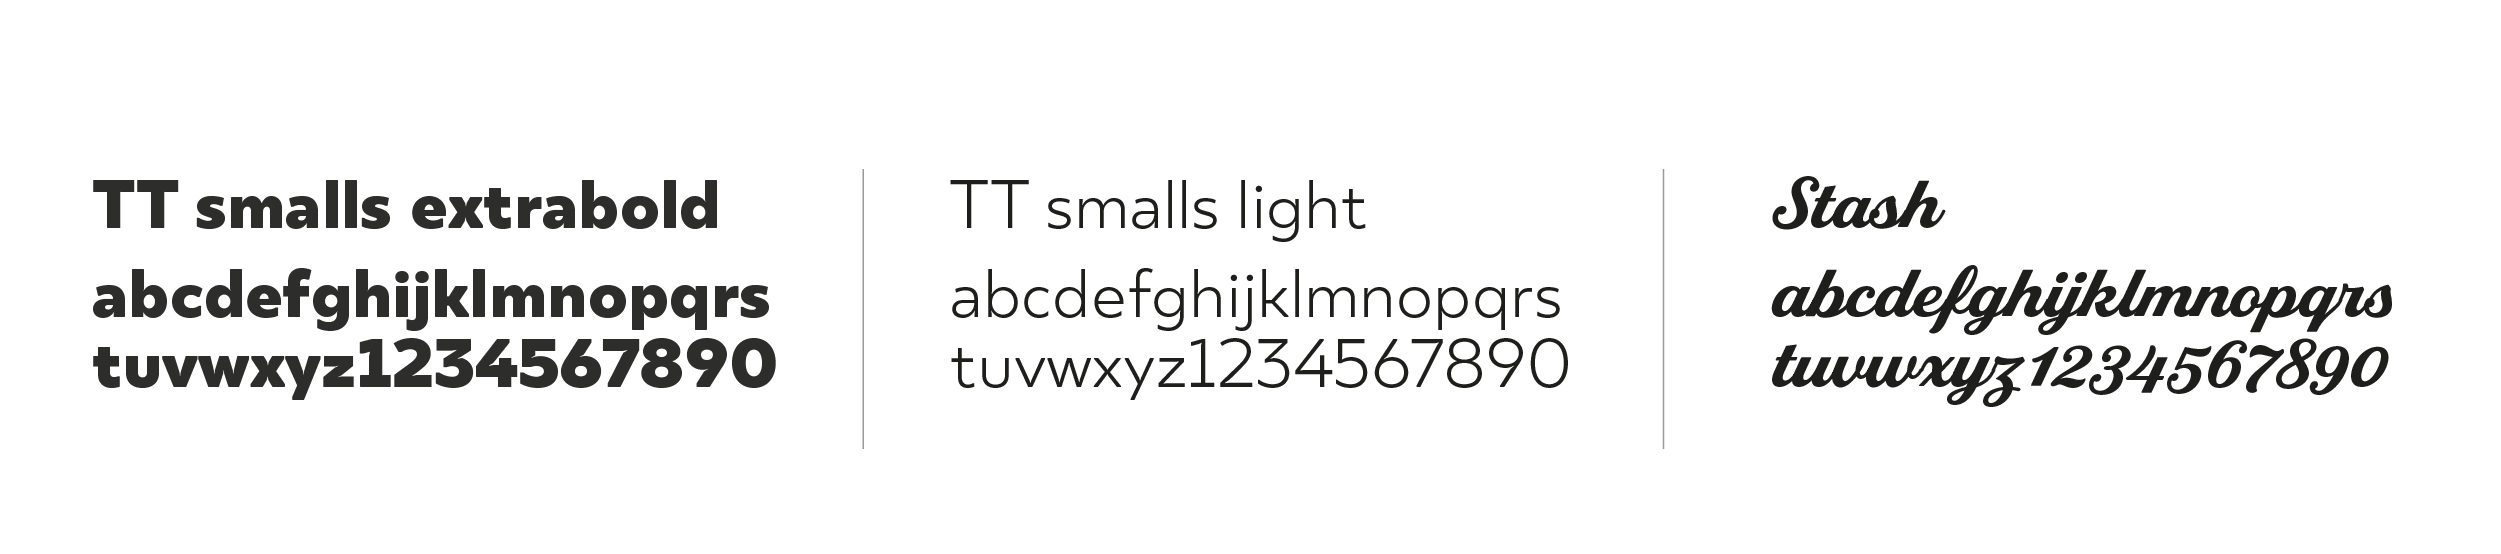 typographie logo brasserie parallele